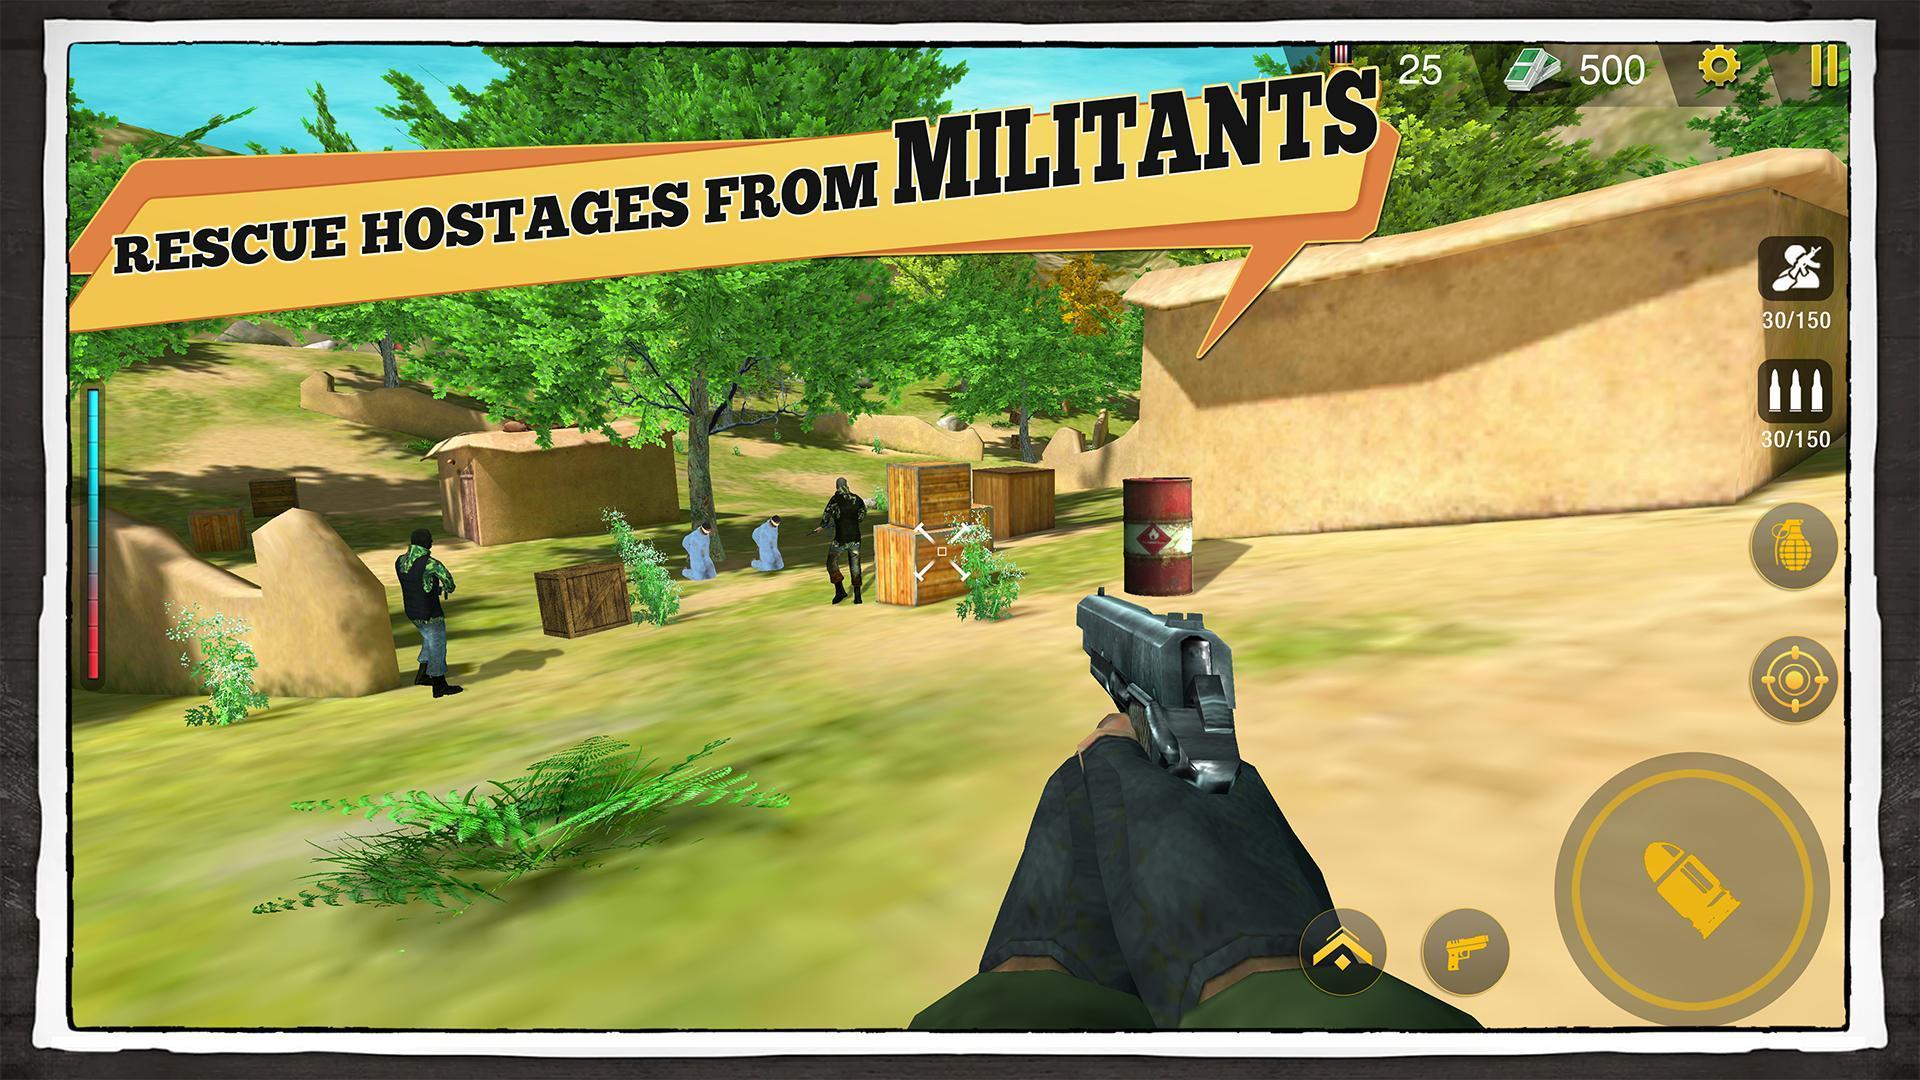 Yalghaar Delta IGI Commando Adventure Mobile Game 3.4 Screenshot 18